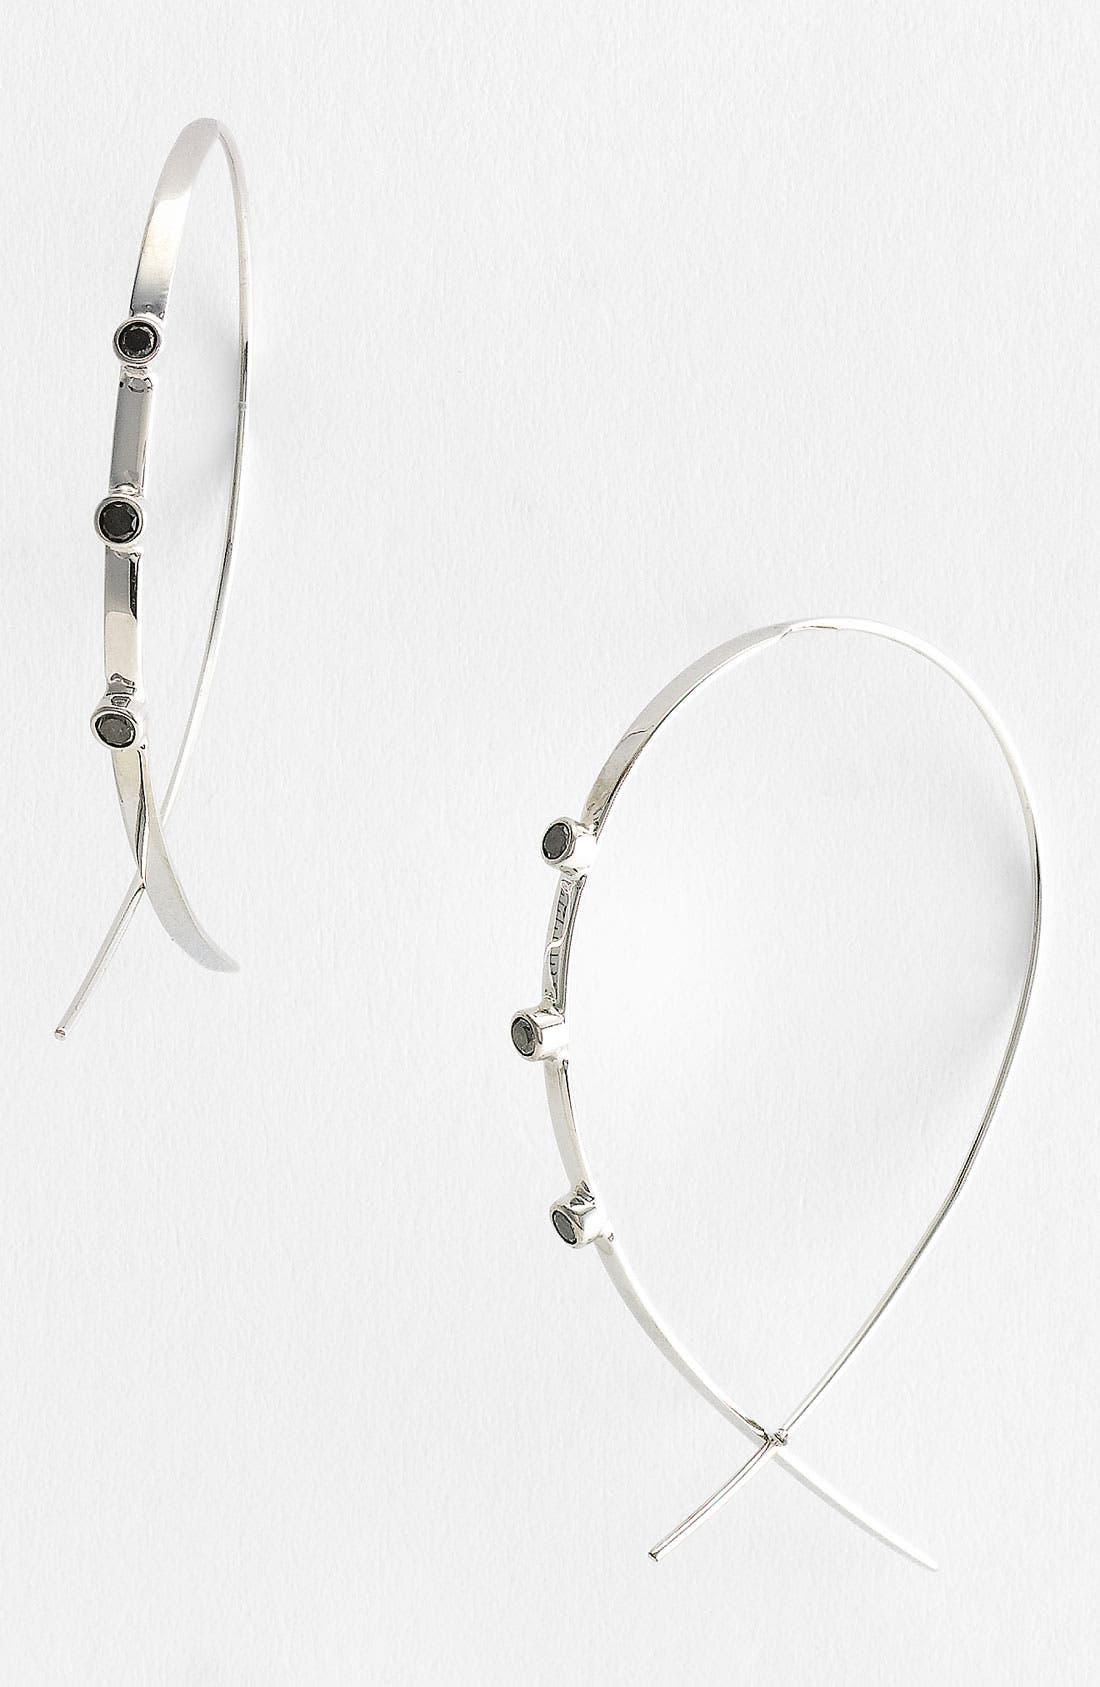 Main Image - Lana Jewelry 'Small Flat Upside Down' Hoop Earrings (Nordstrom Exclusive)